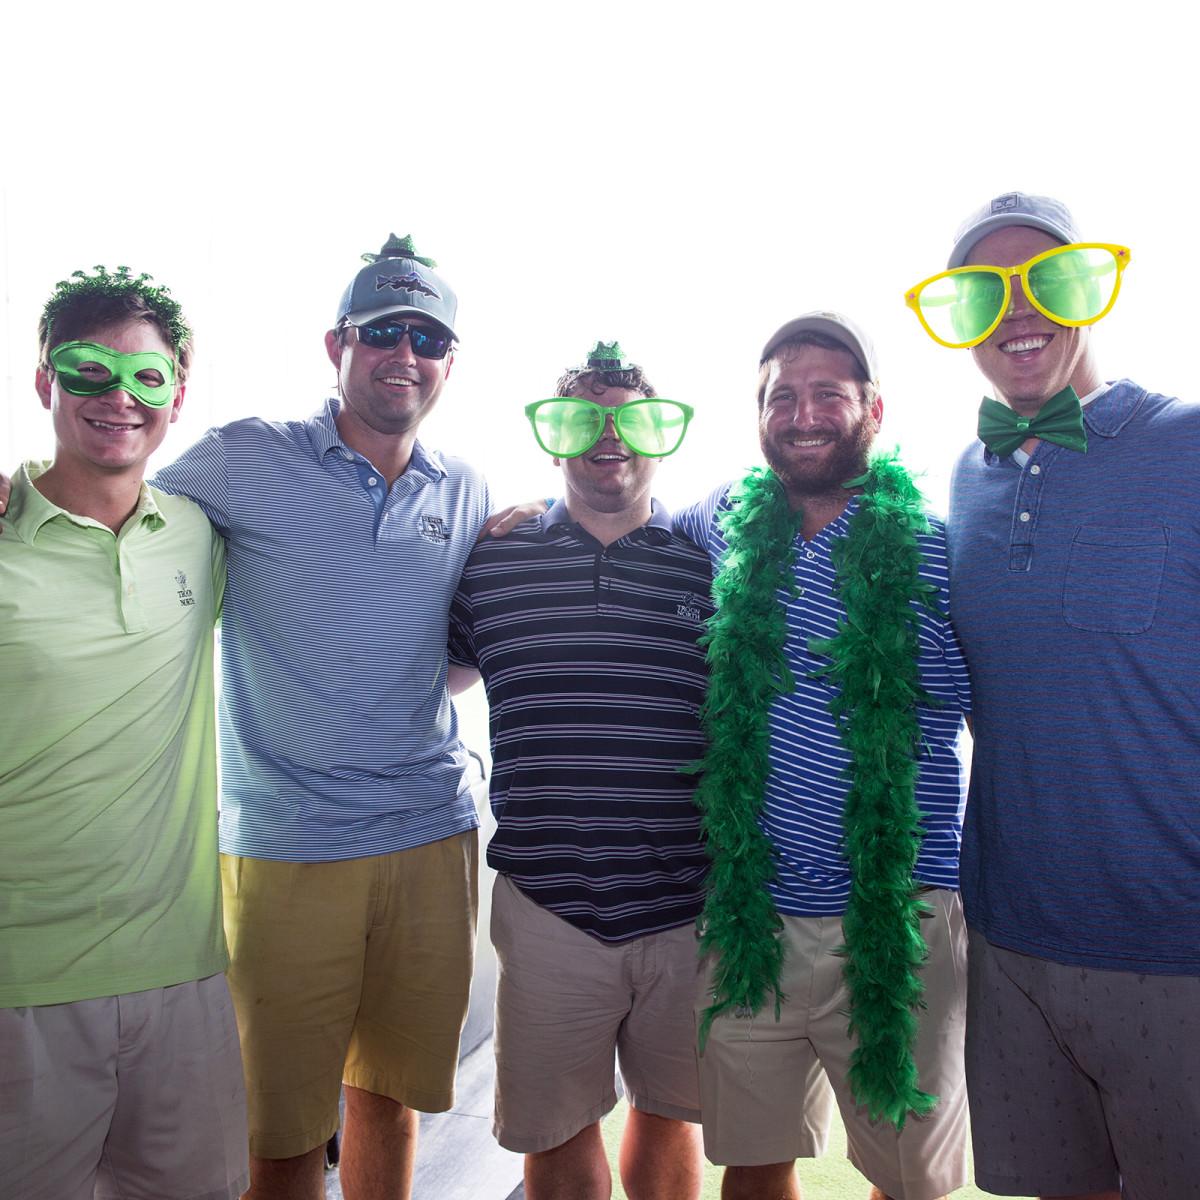 Houston, TeeUp for NFCC 6, May 2017, Matt Cire, Marshall Holmes, Griffen Guthneck, Simon Feinsilver, Matt Steitz